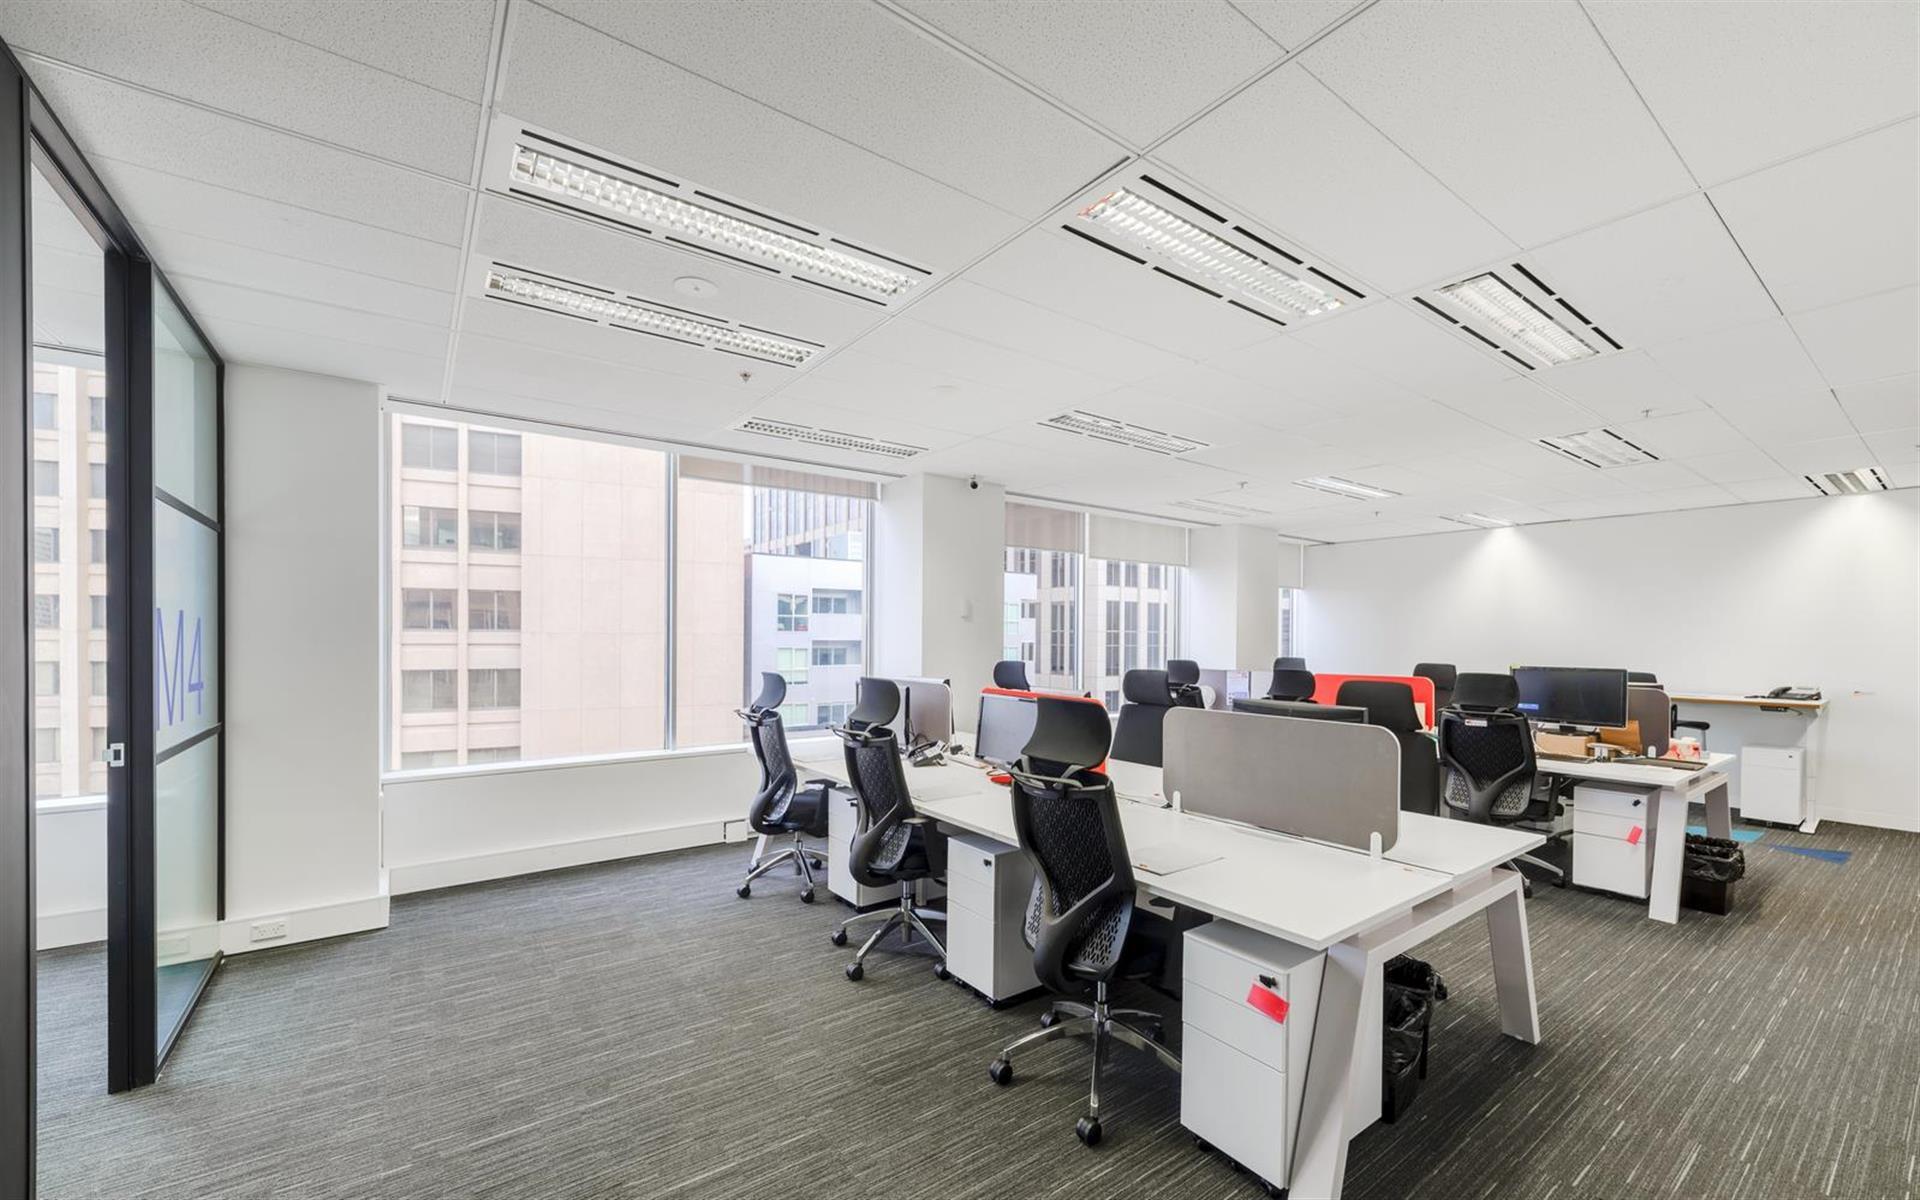 330 Collins Street Business Centre - Co- Working Flexidesks @ 330 Collins